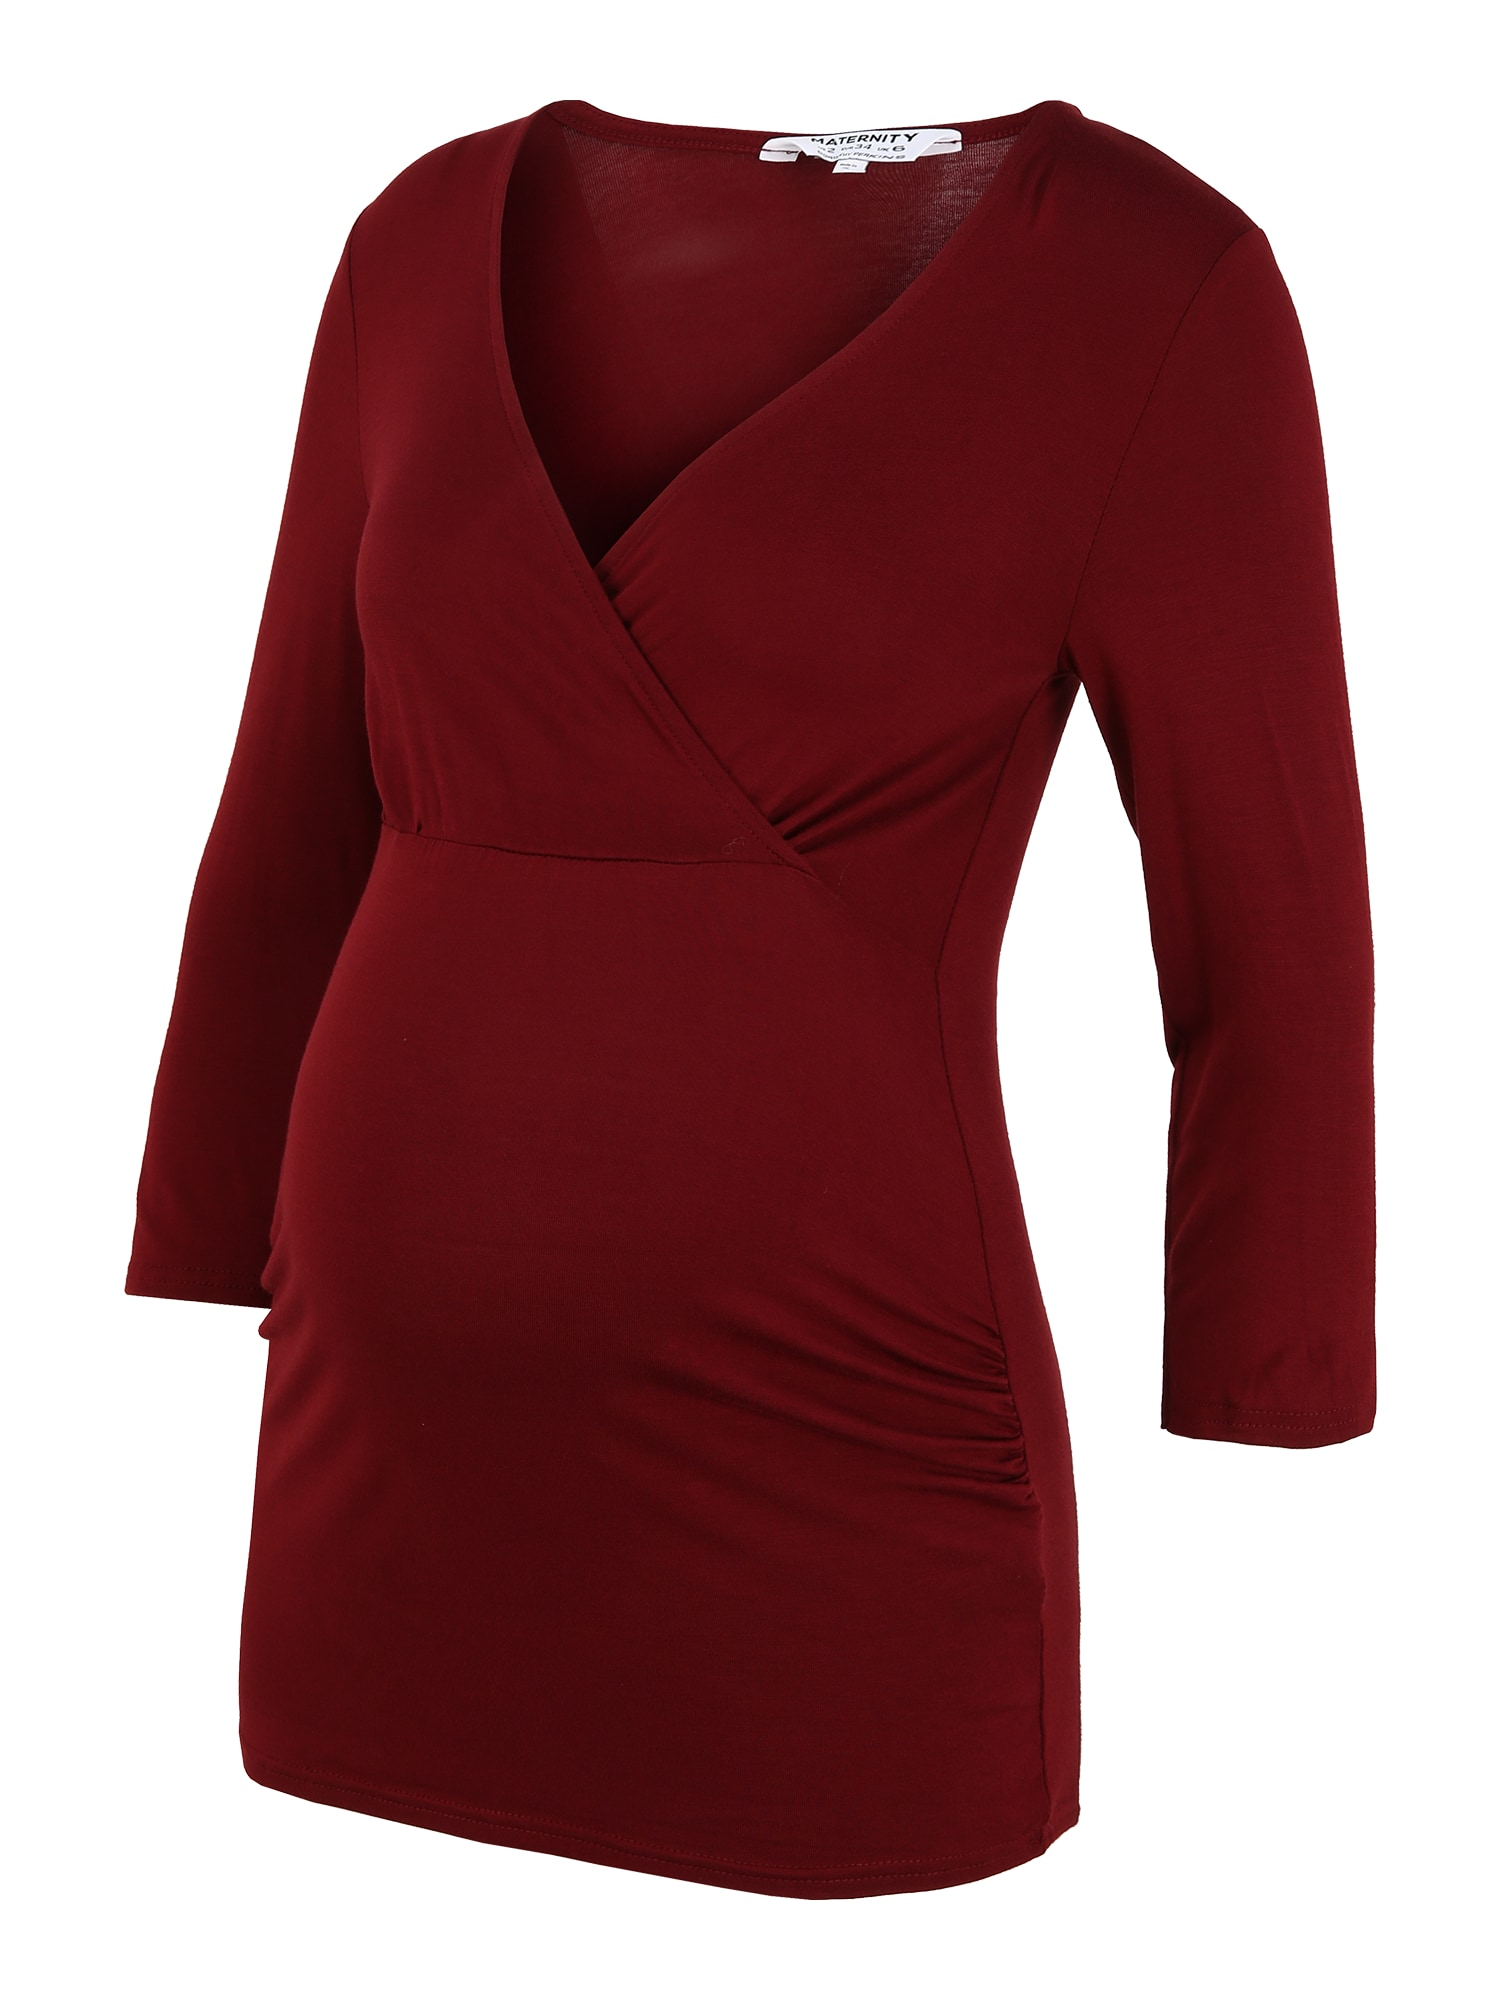 Dorothy Perkins Maternity Marškinėliai vyno raudona spalva